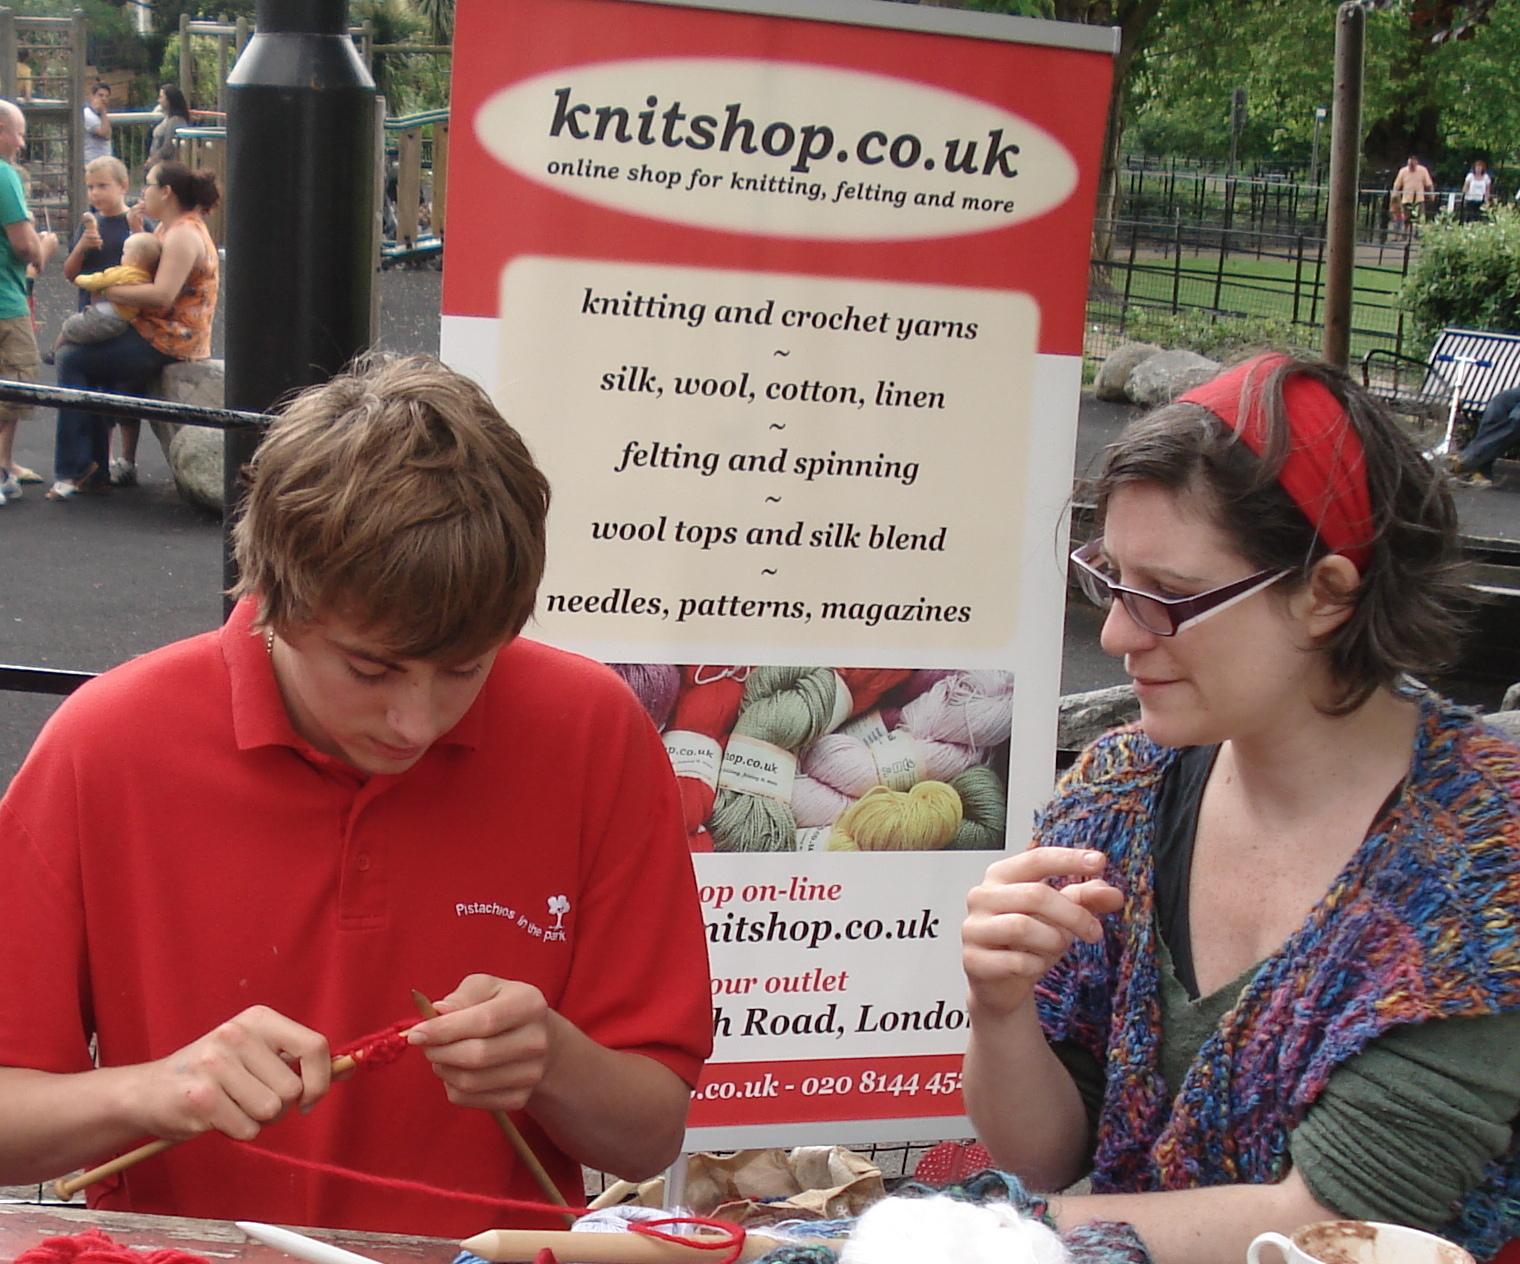 Knitting at Manor House Park